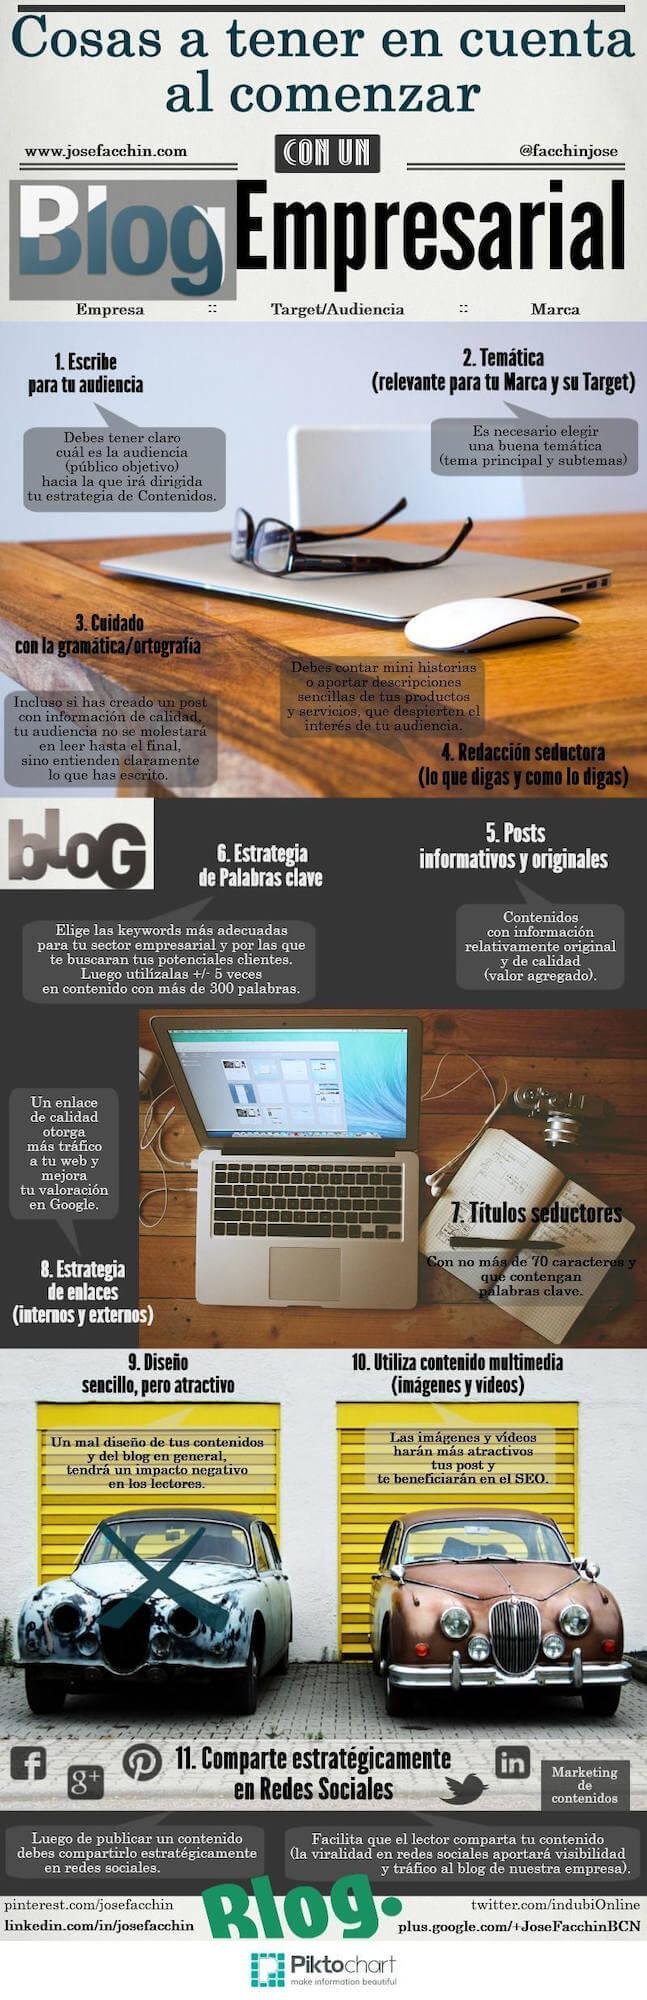 Blog empresarial Infografía